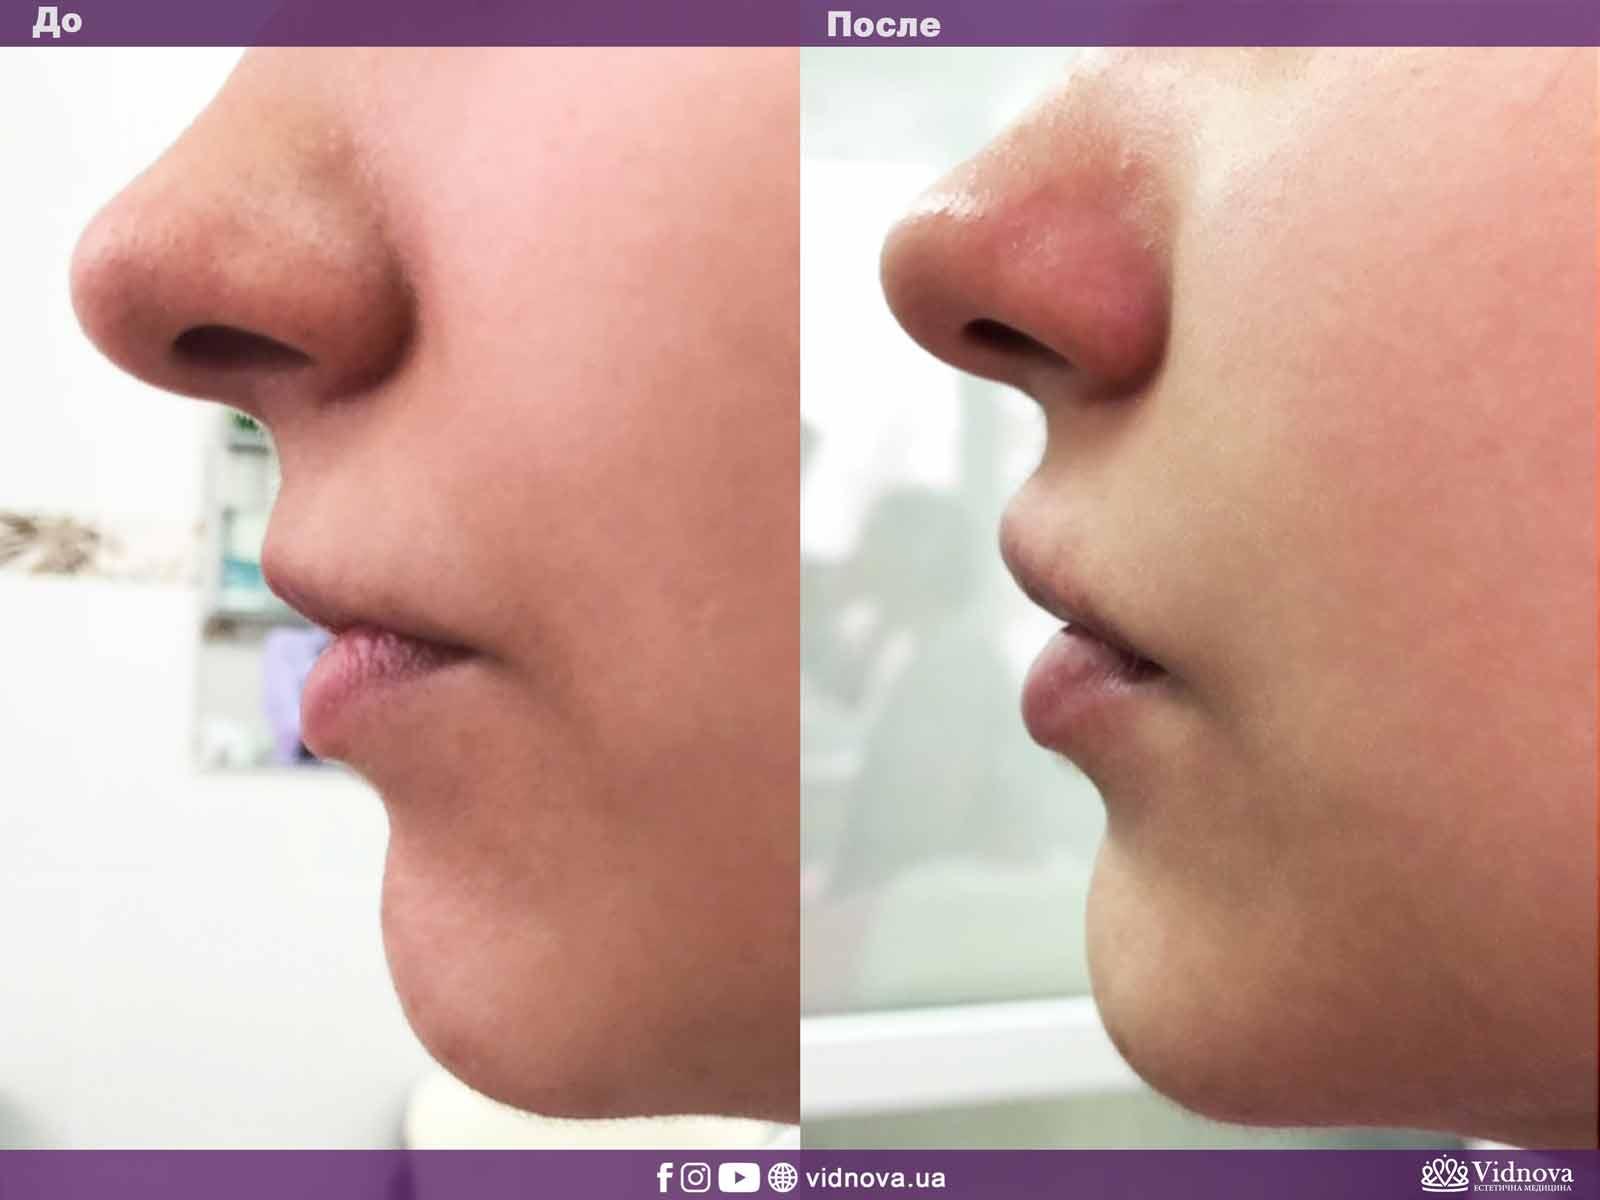 Увеличение губ: Фото До и После - Пример №12-2 - Клиника Vidnova